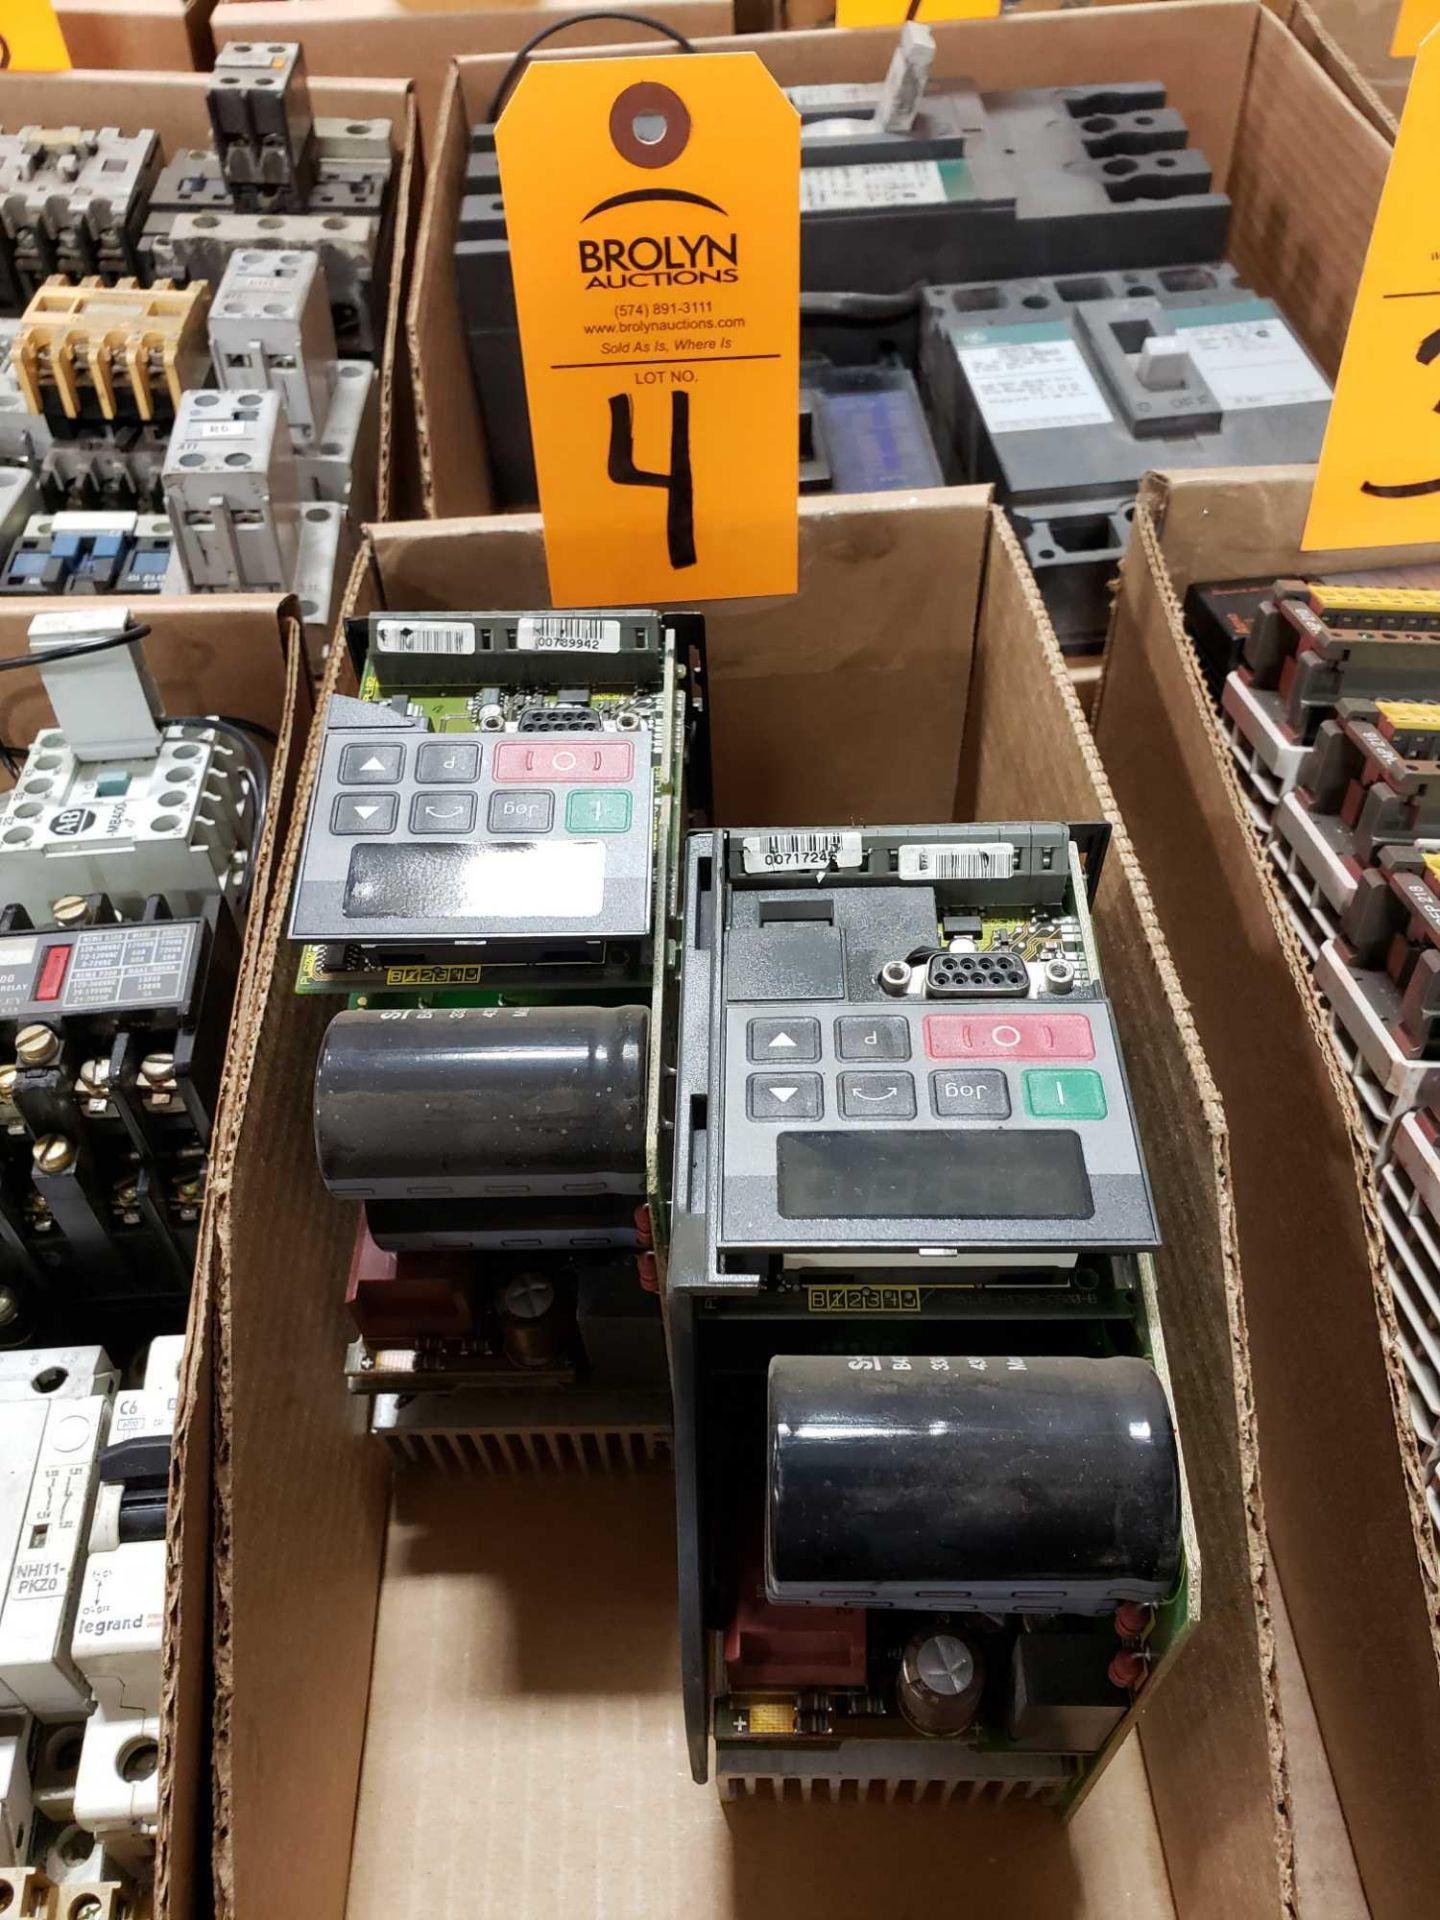 Lot 4 - Qty 2 - Siemens drives. Cases broken/missing.